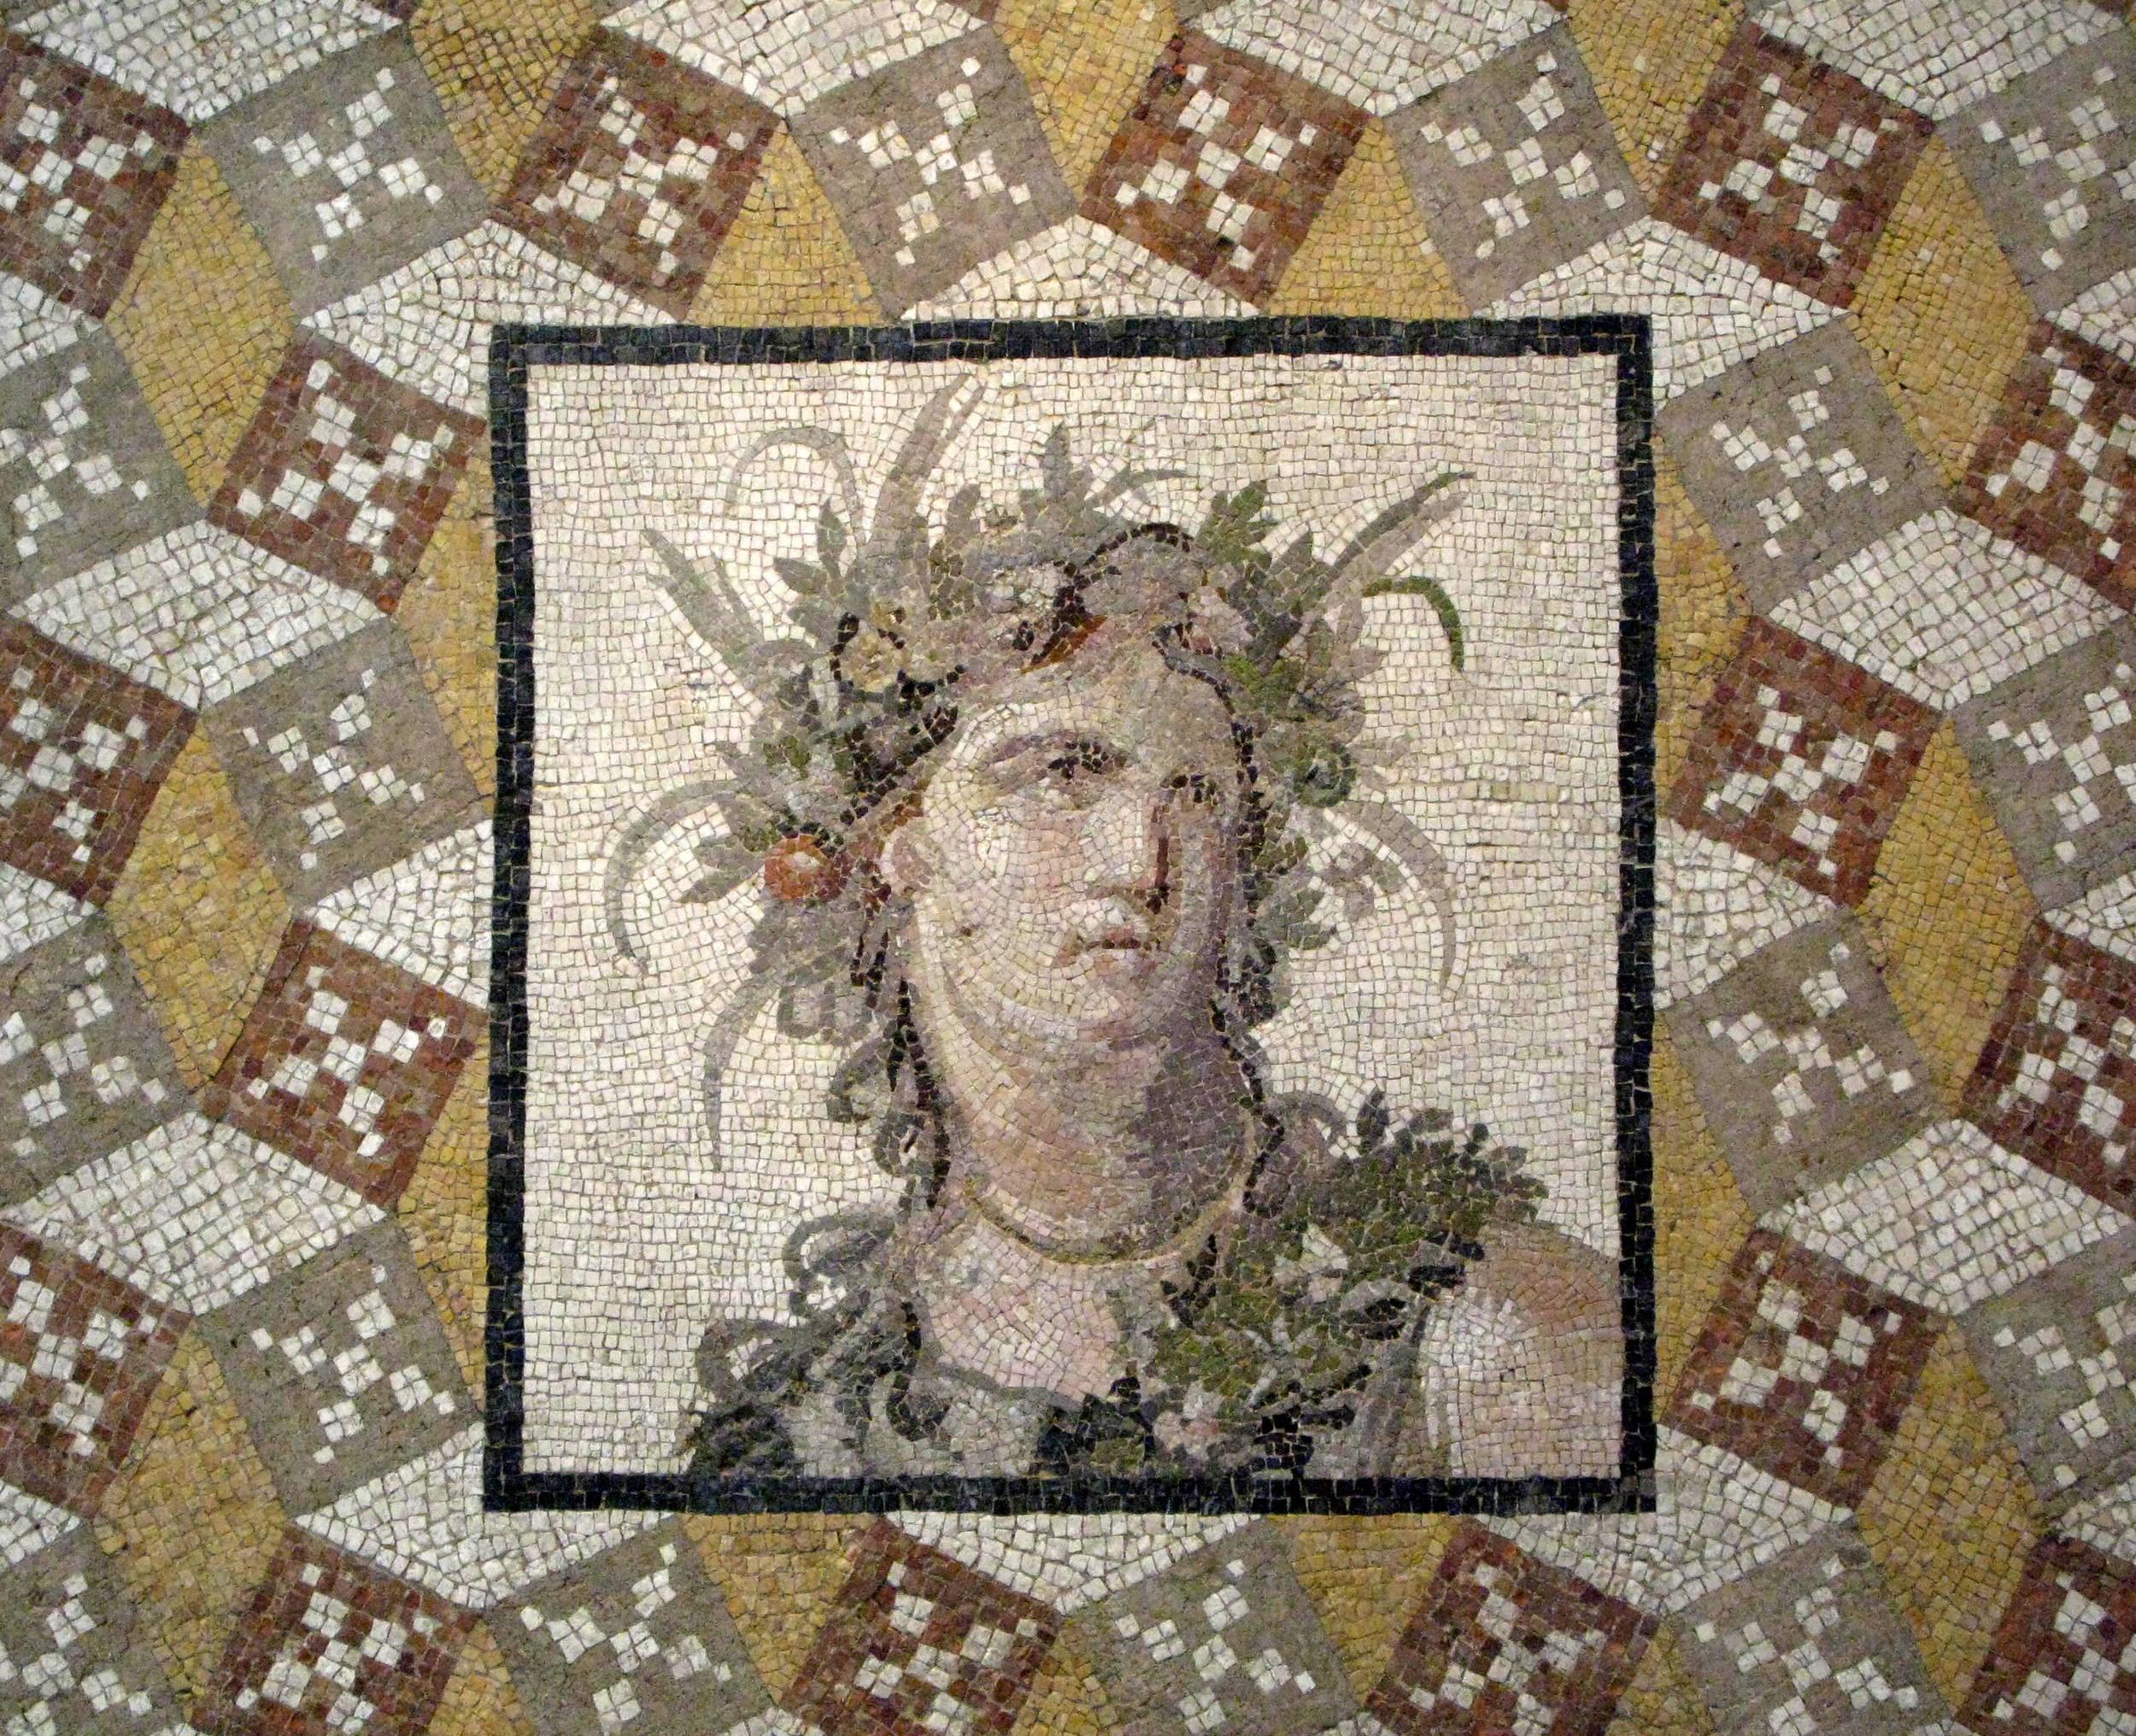 Roman mosaic, from the Metropolitan in NY.